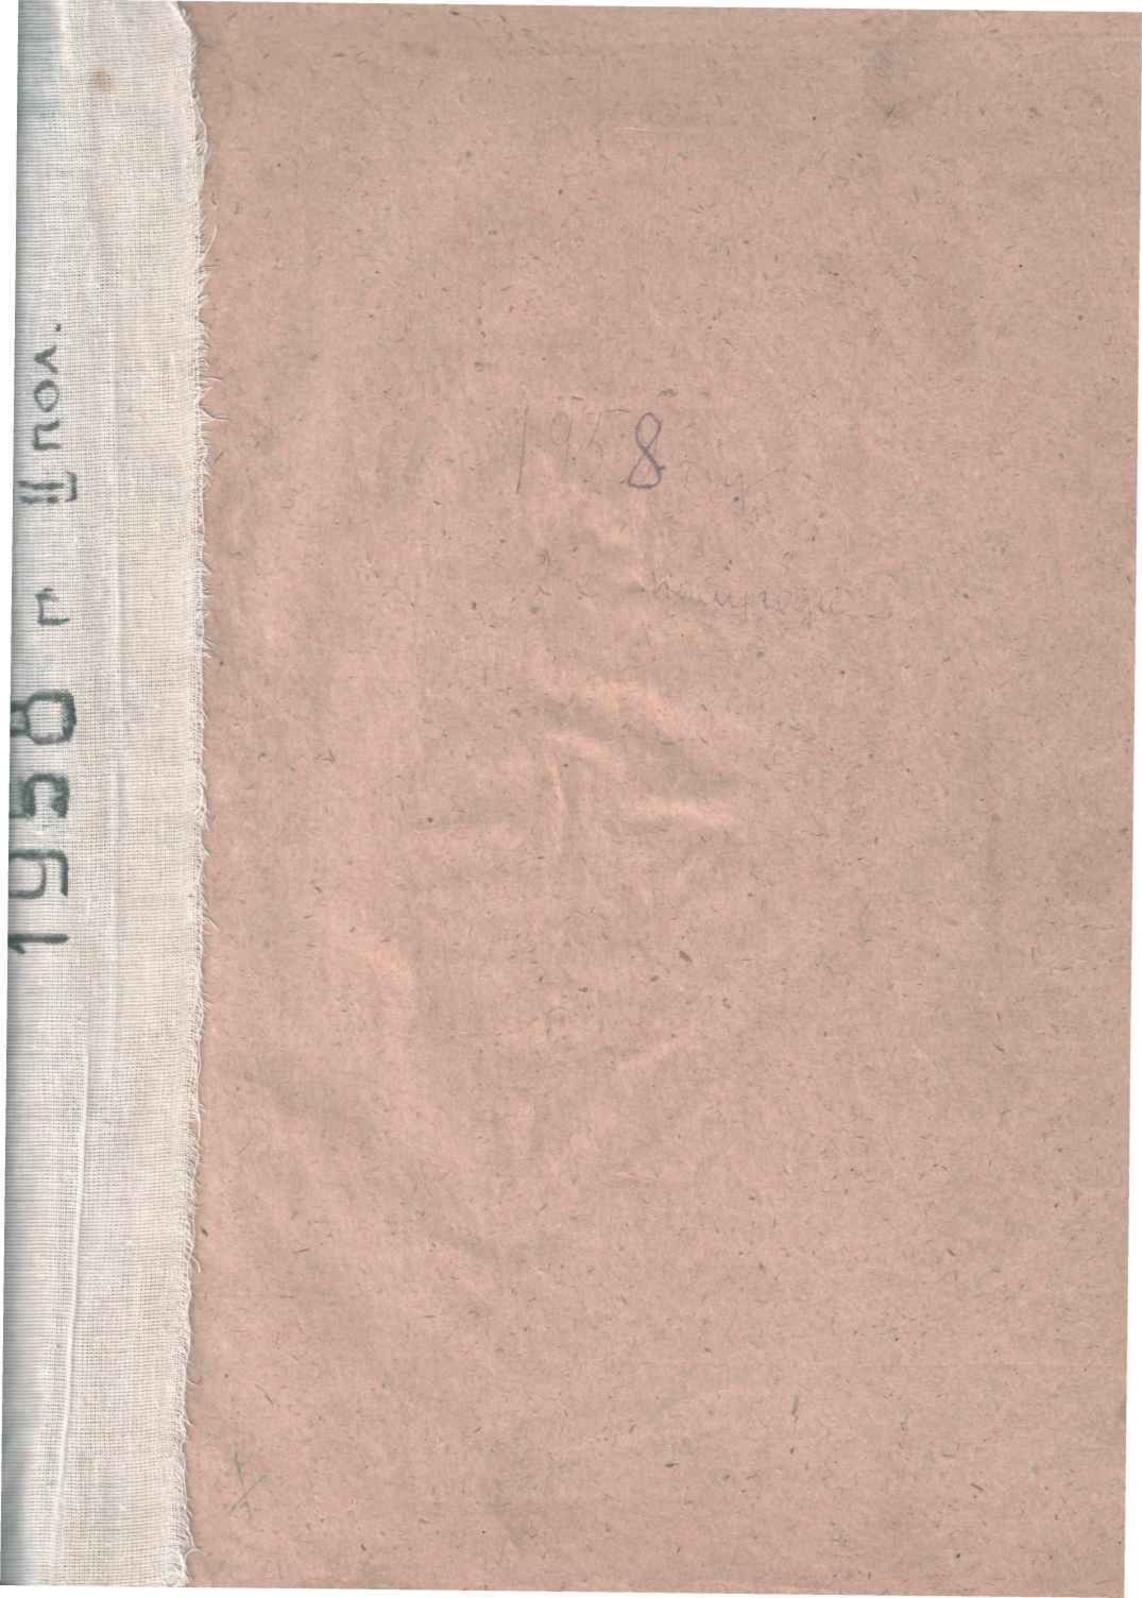 e9b2b80f4 Calaméo - Ленинское знамя 1958 2 полугодие